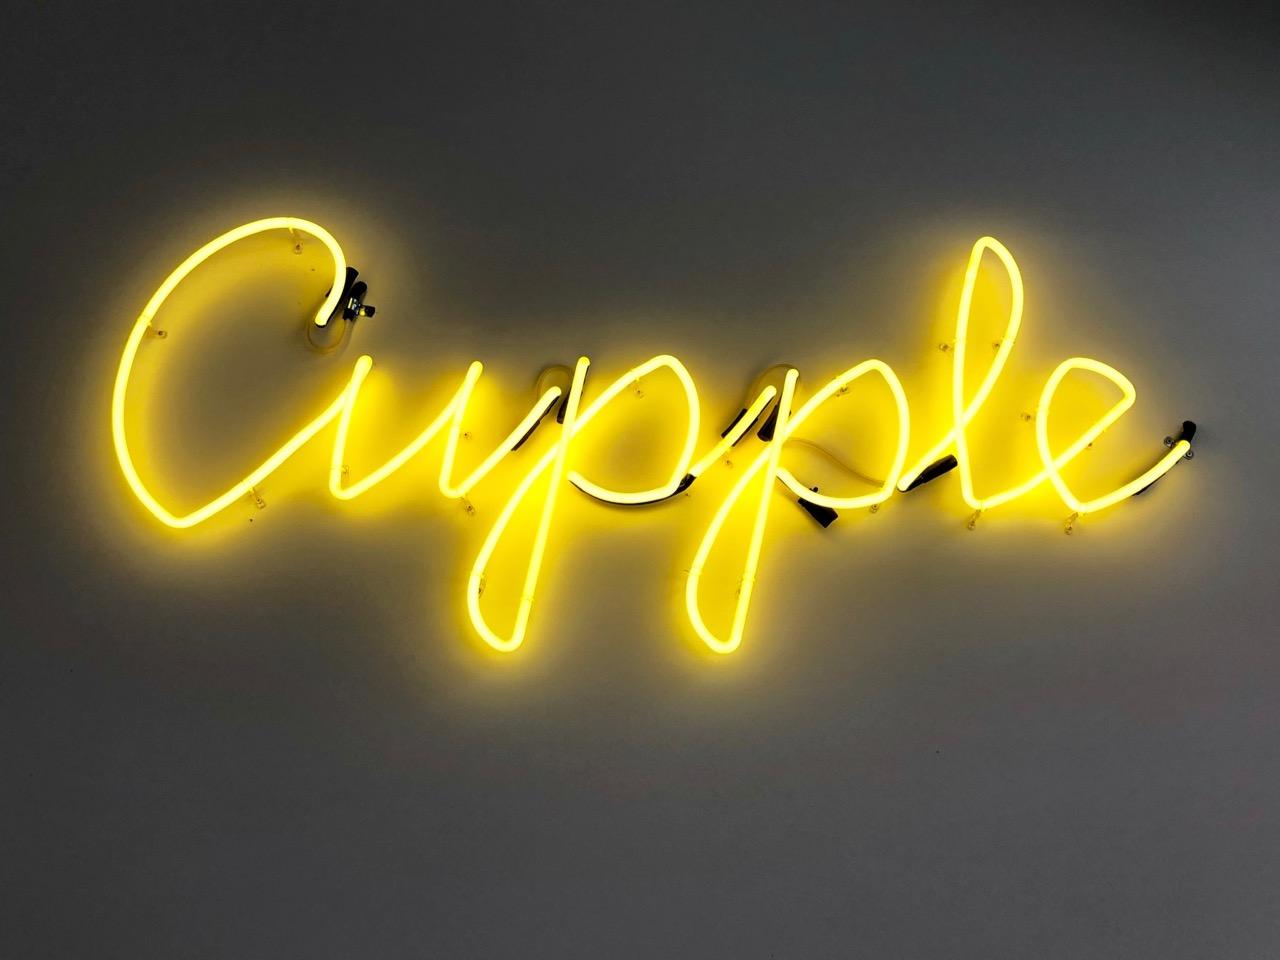 Cupple